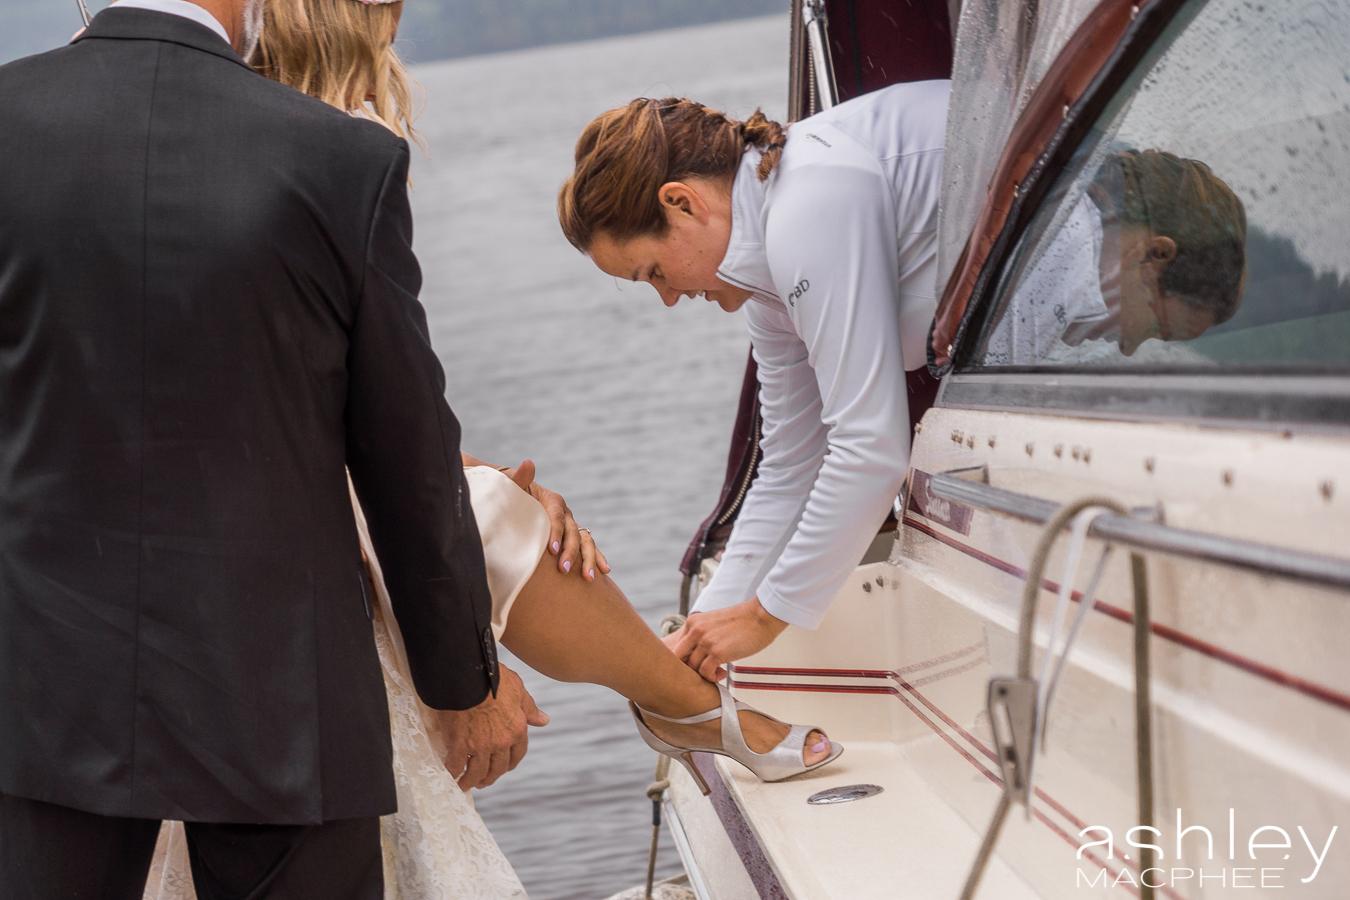 Ashley MacPhee Photography Hudson Yacht Club wedding photographer (30 of 112).jpg